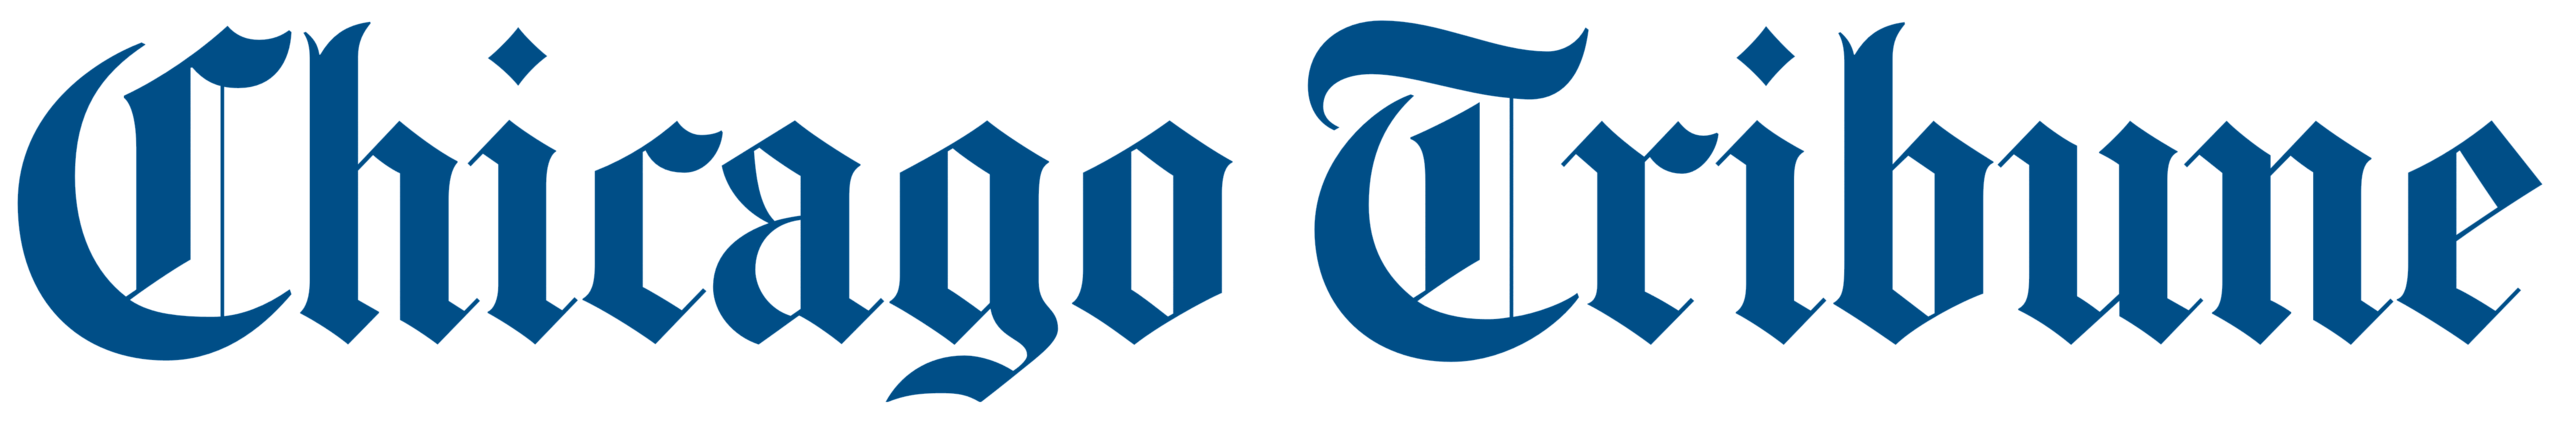 Chicago Tribune - Personal Branding